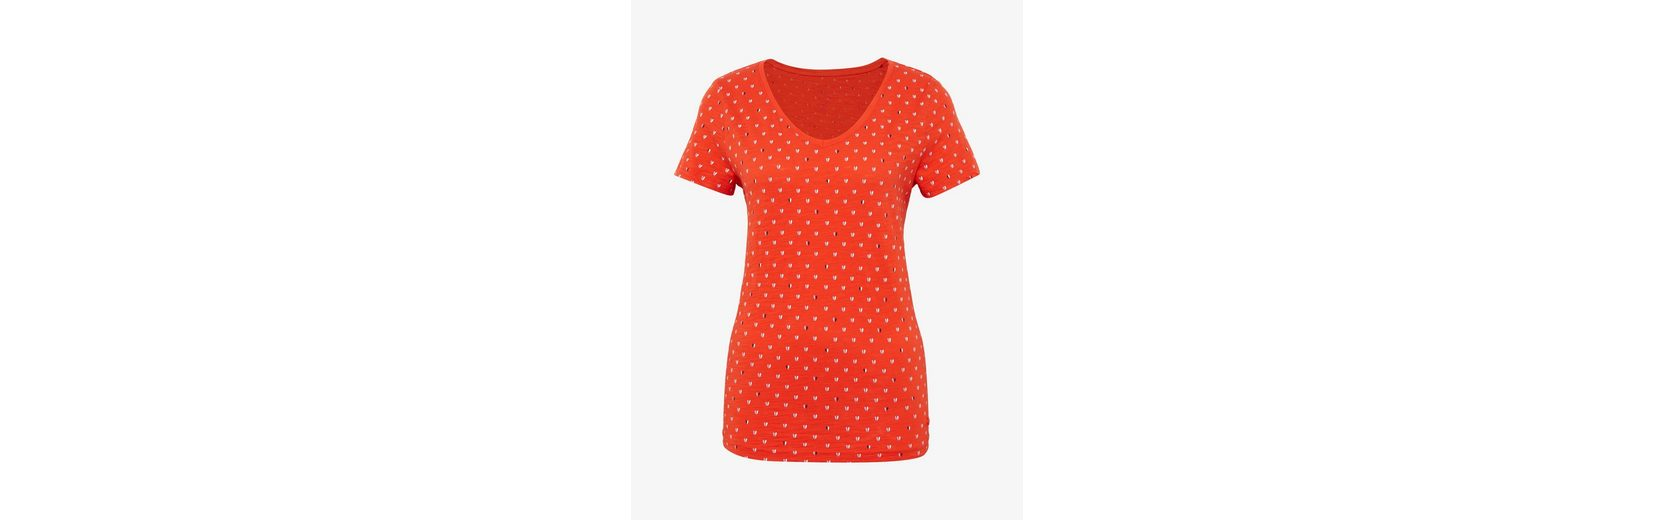 Tom Tailor T-Shirt T-Shirt mit Valentinstag-Print Webseiten o52yQ